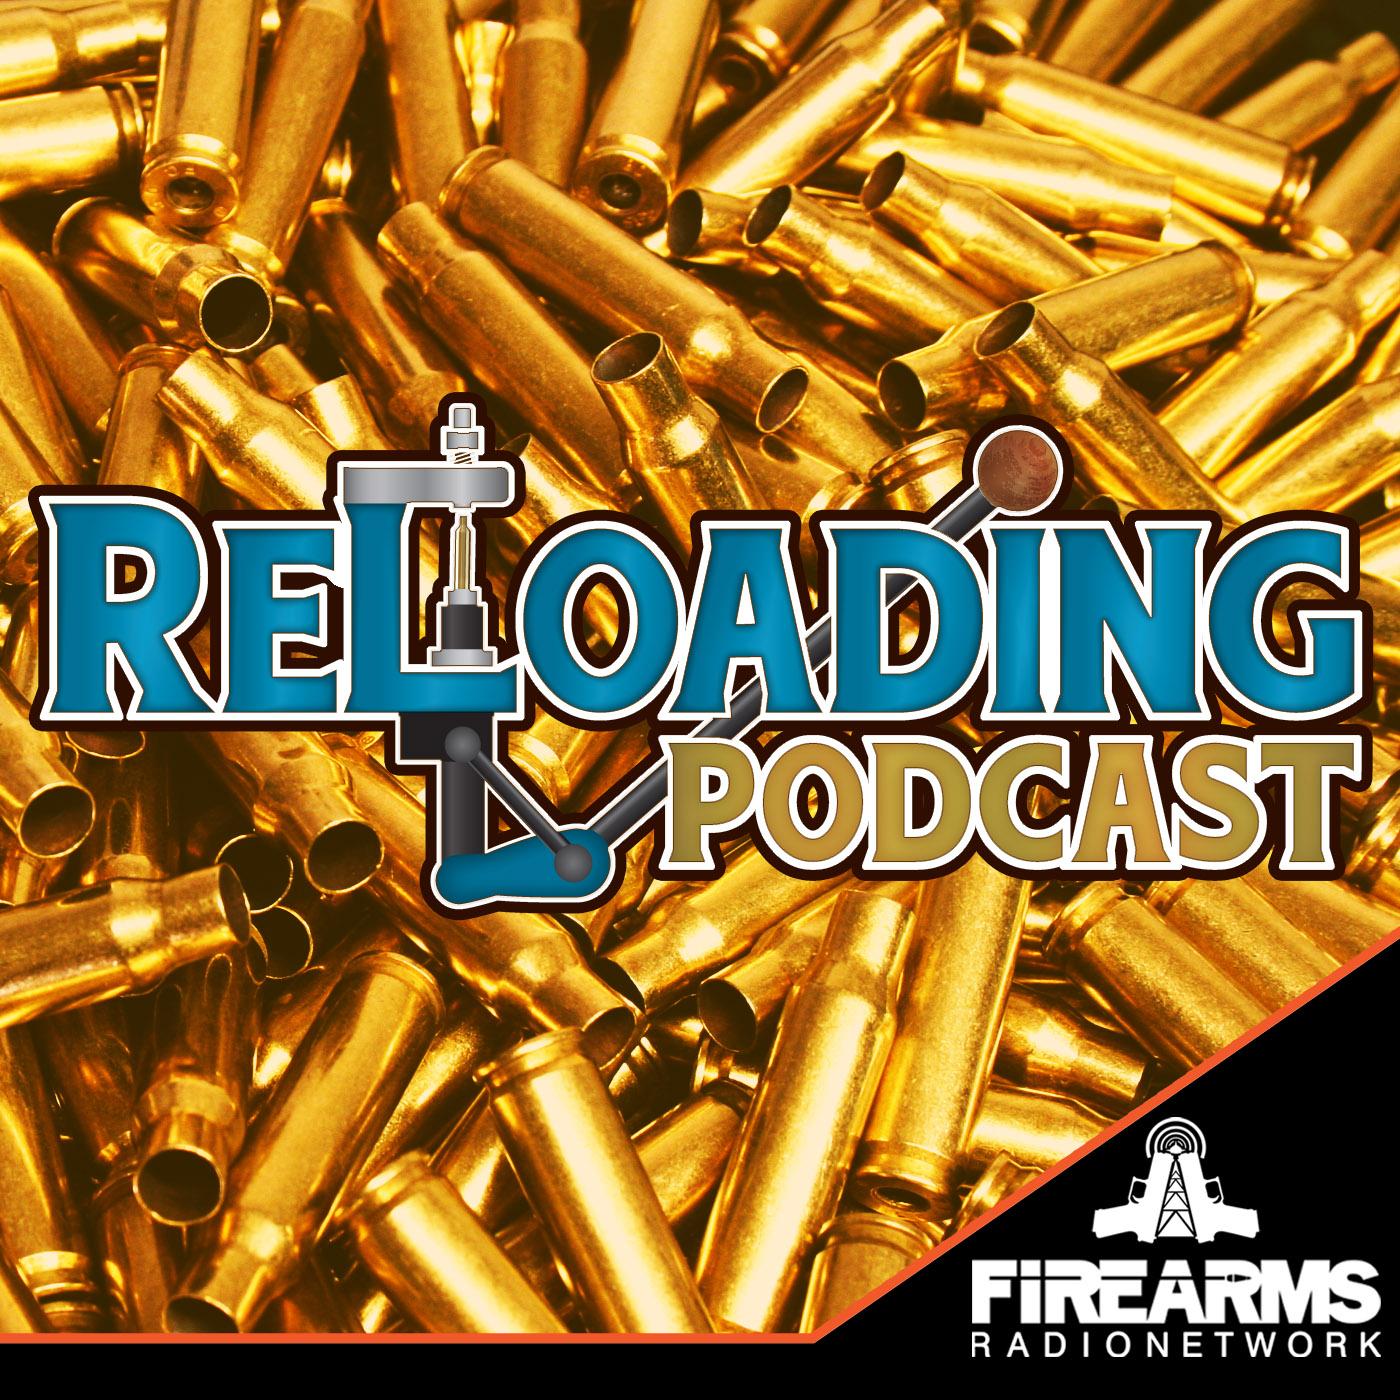 Reloading Podcast 253 - carpet or concrete — Firearms Radio